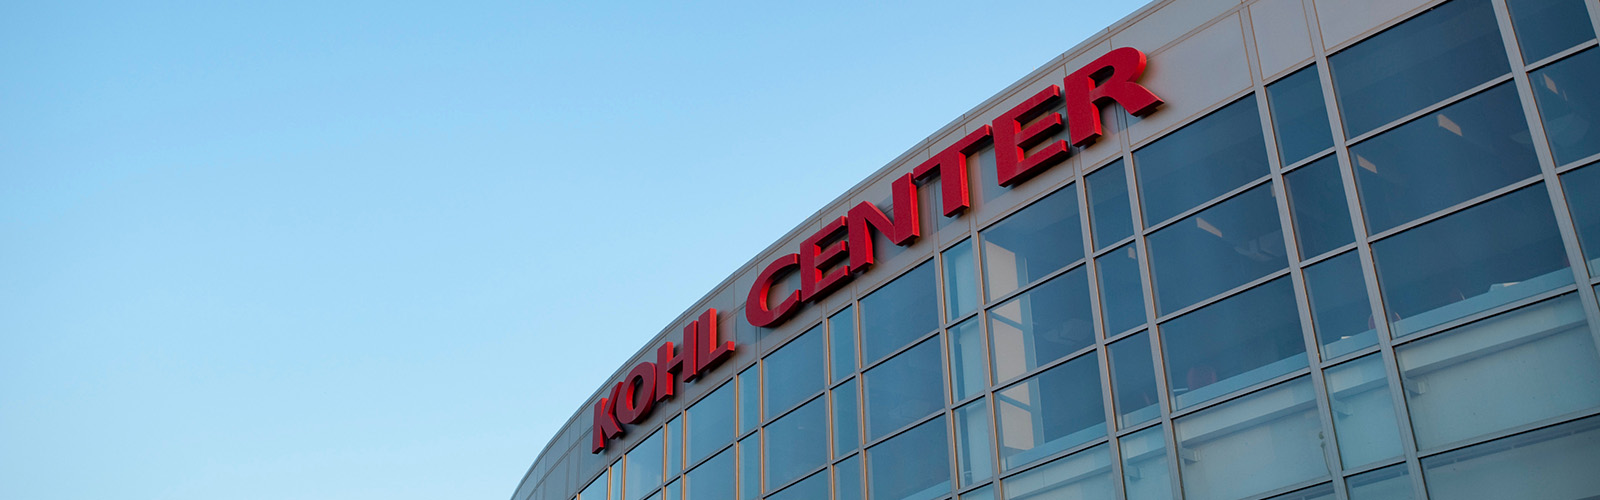 Kohl Center at UW-Madison